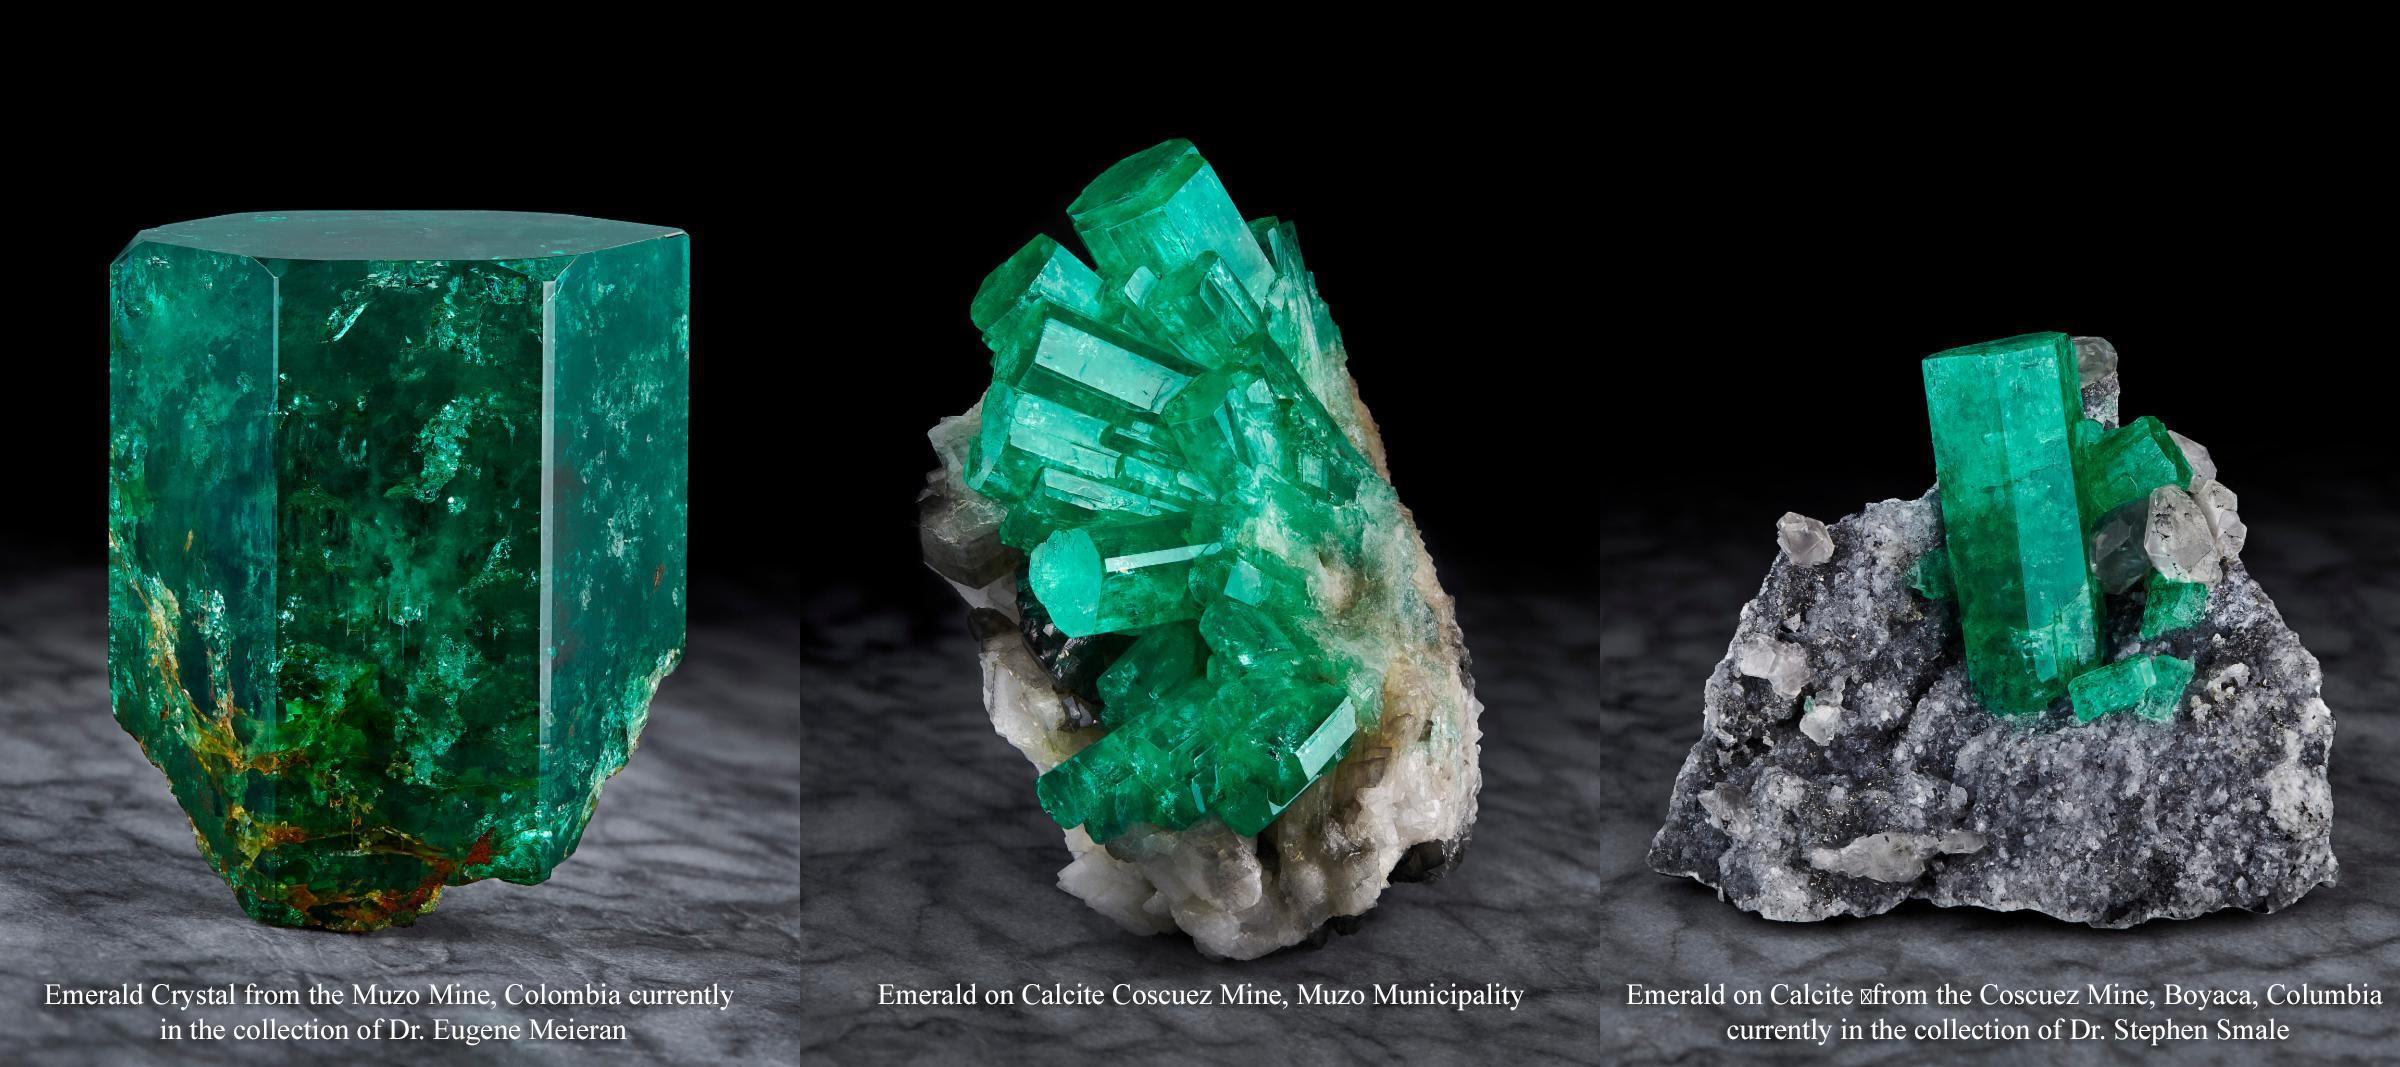 Magnificent Emeralds Furas Tears News